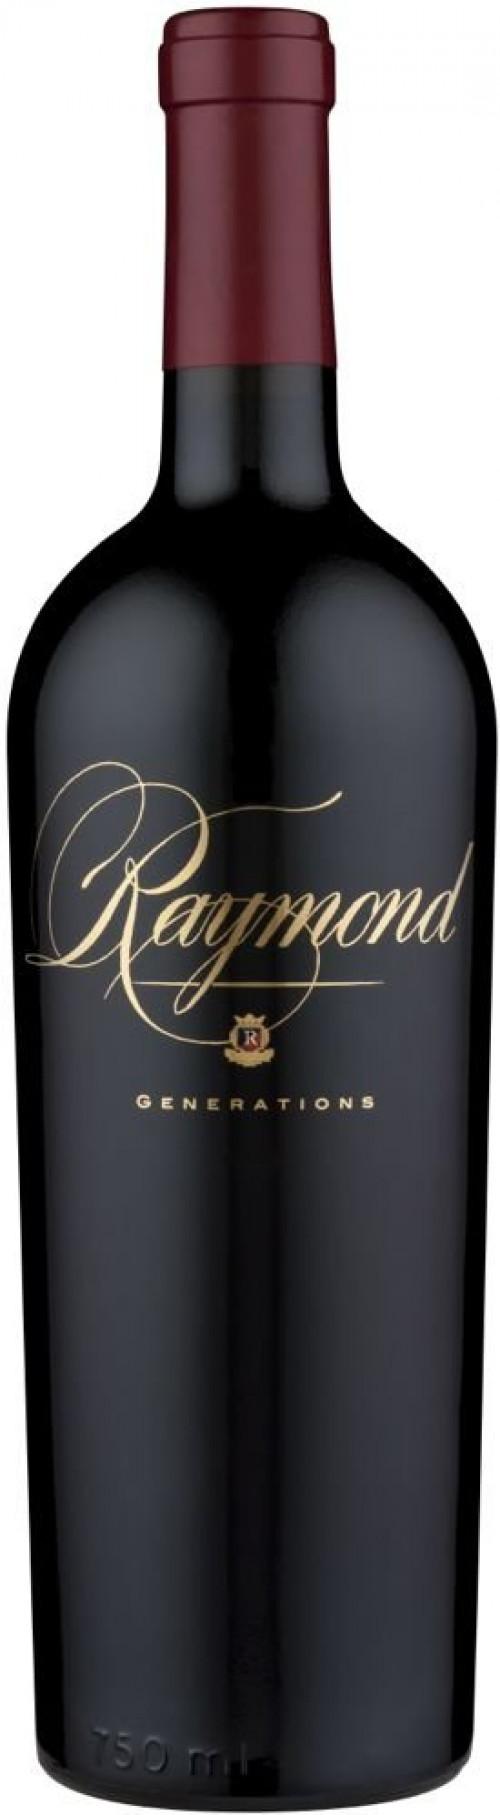 2018 Raymond Generations Red 750ml